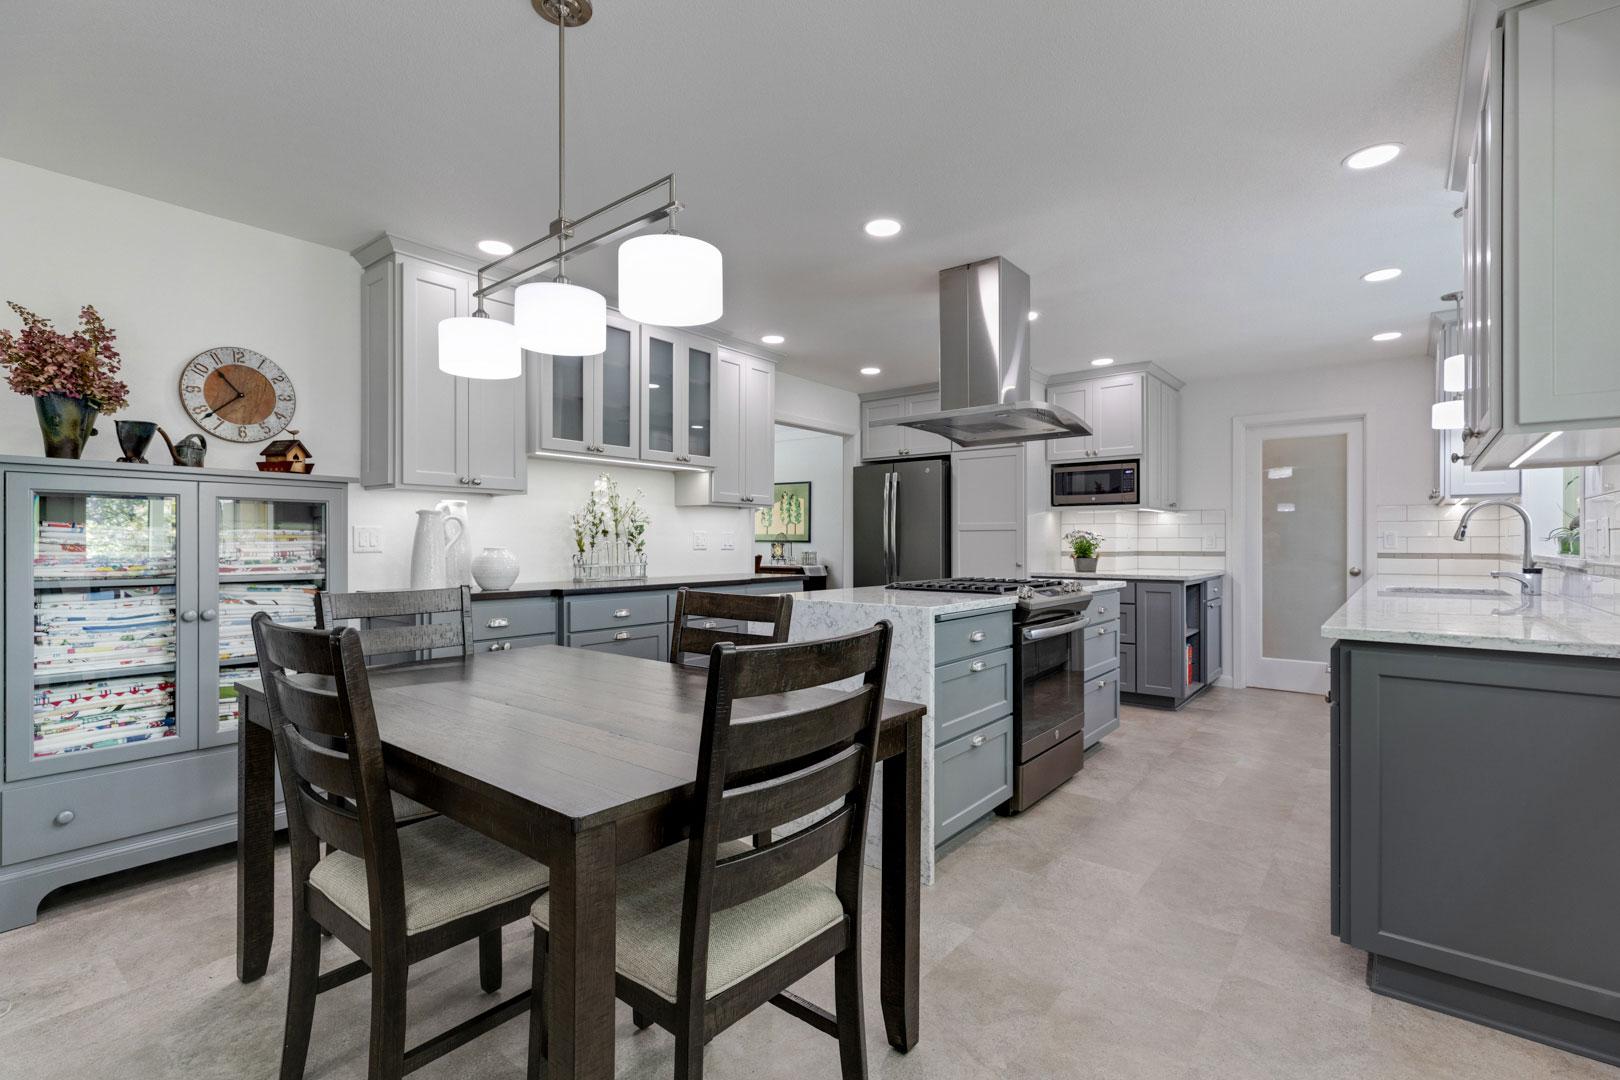 kitchen design - Henderer Design + Build, Corvallis OR